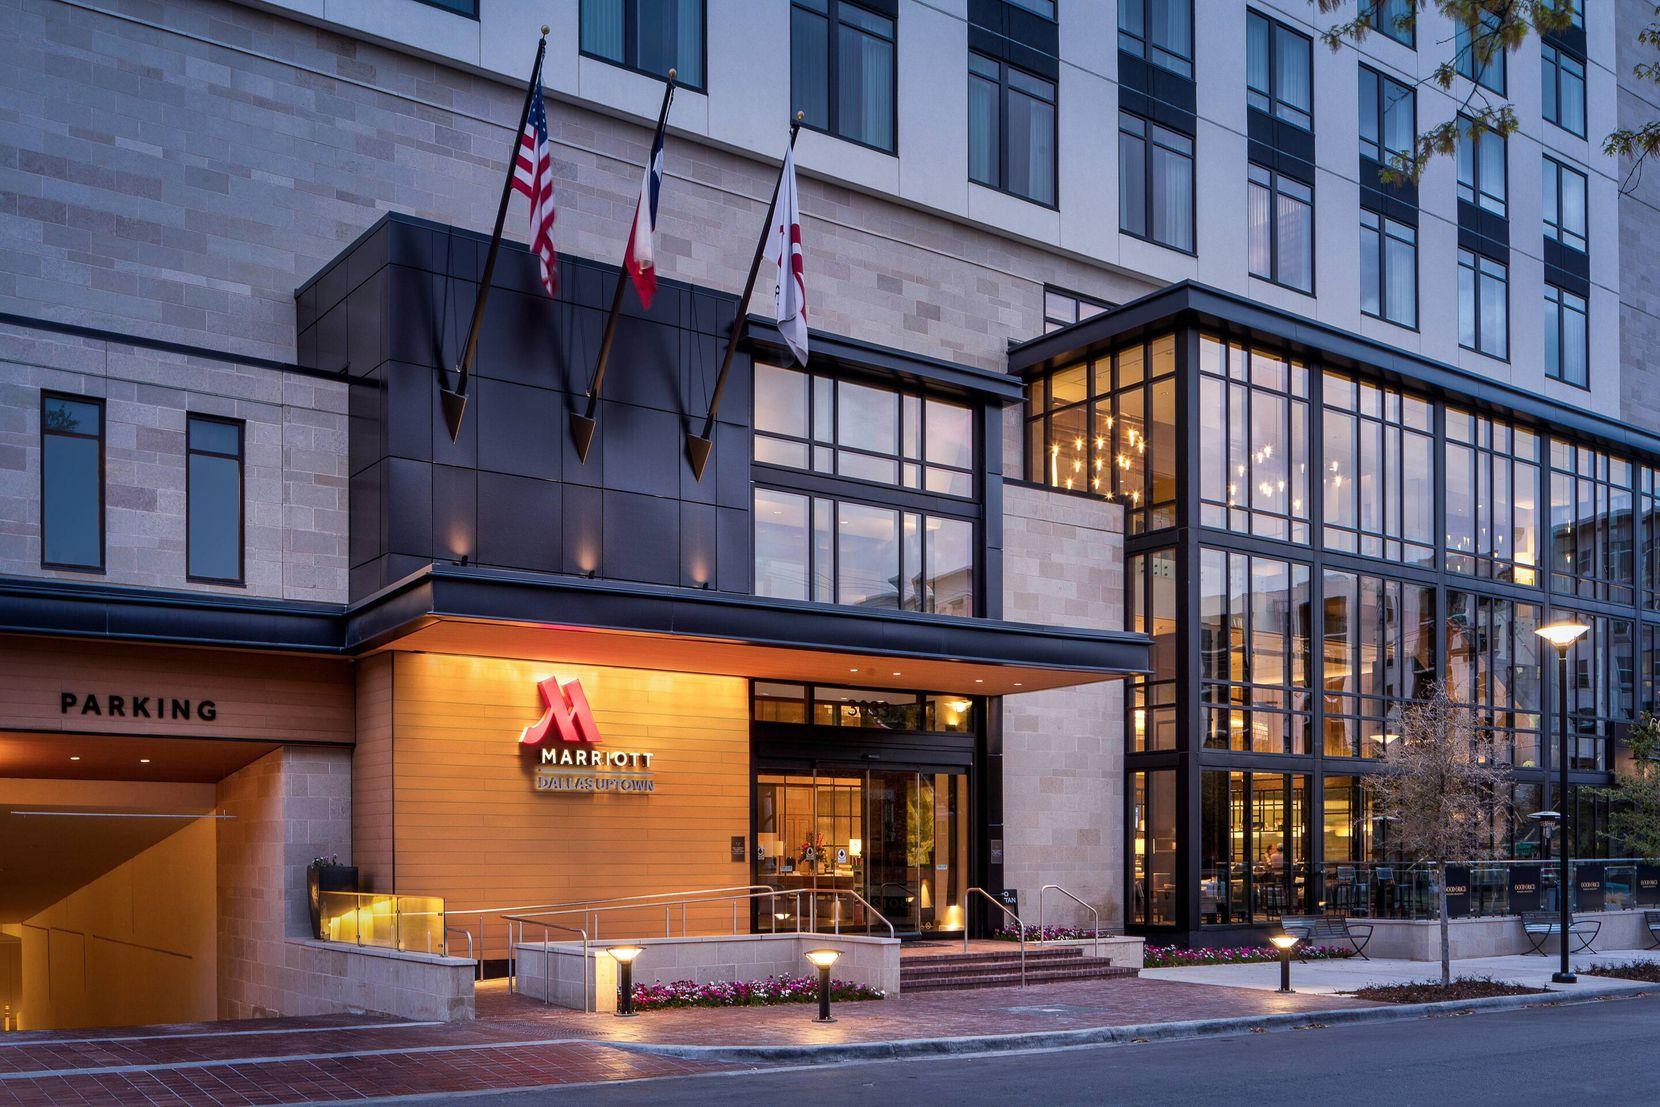 Alamo Manhattan's Marriott Dallas Uptown in February.